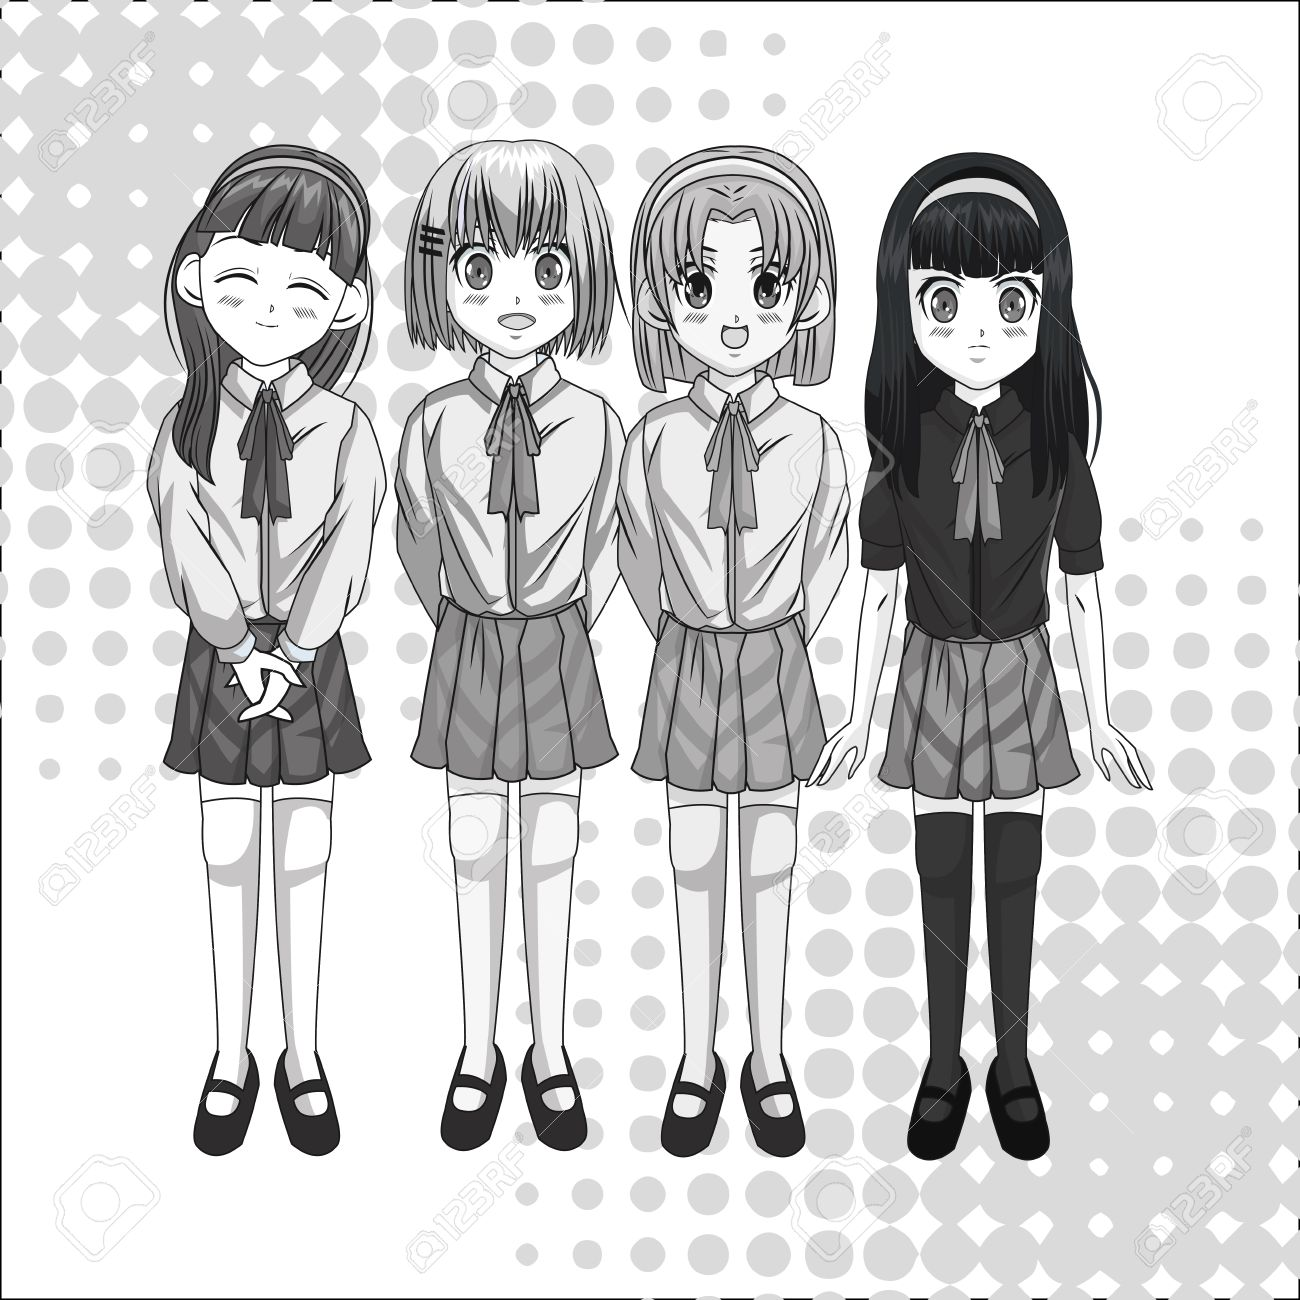 Cartoon and student girl kid anime manga and comic theme grey design pointed